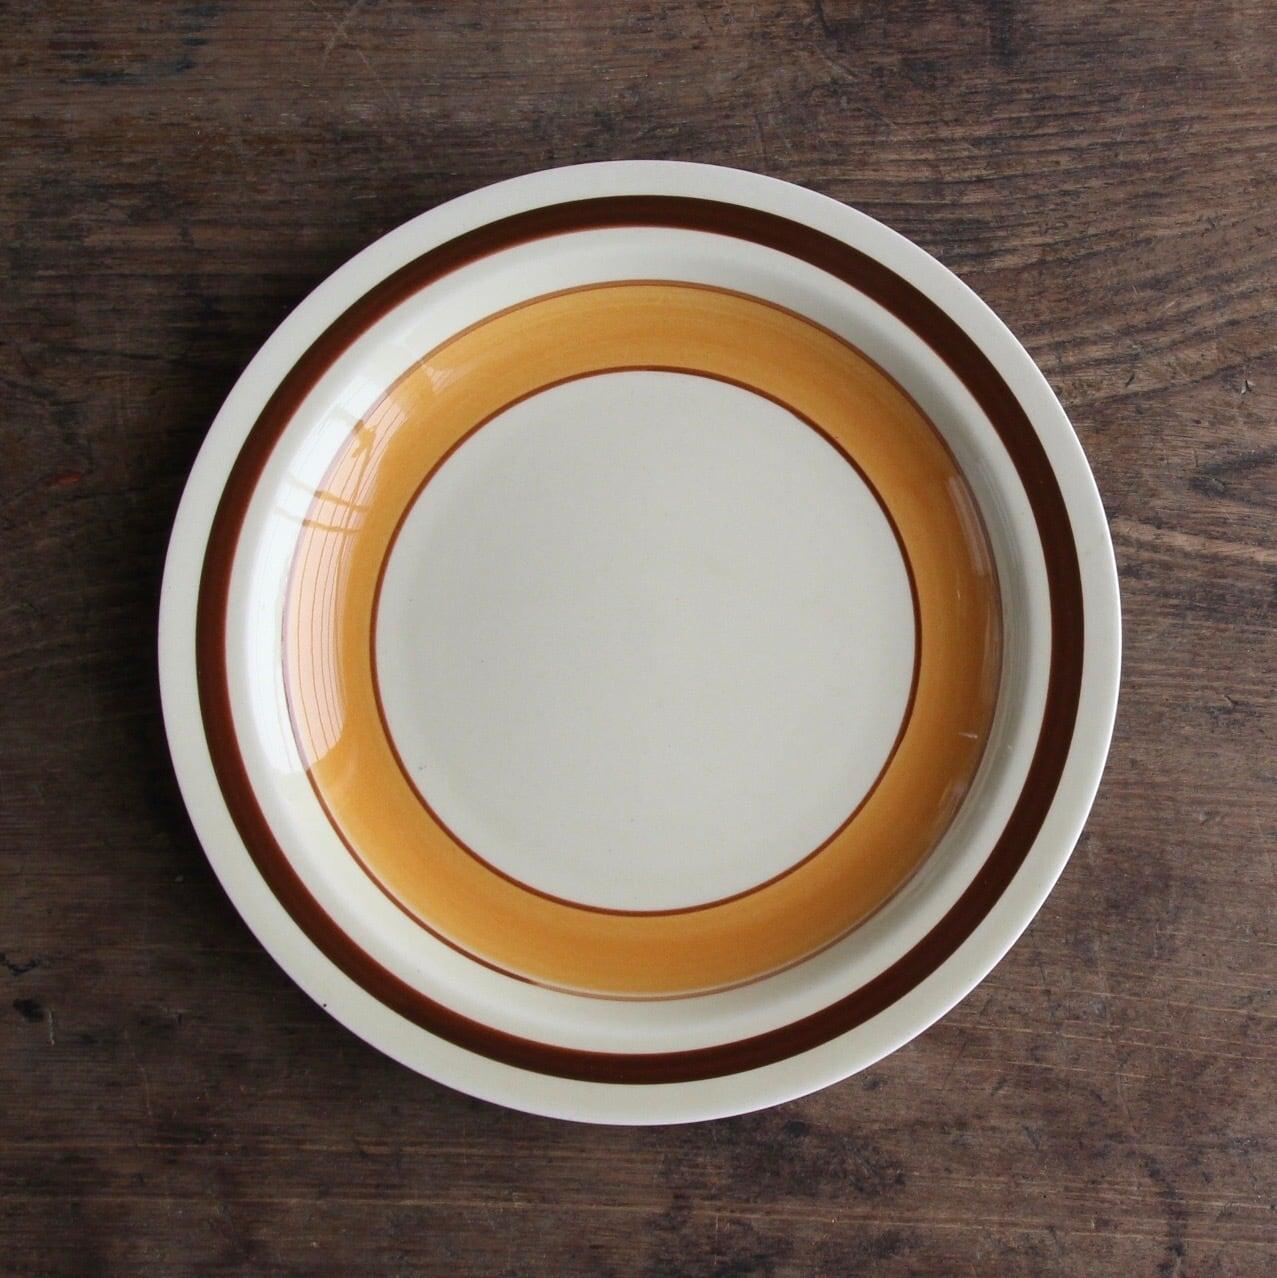 TSUJIMOTO TOKI レトロな小皿 在庫5枚